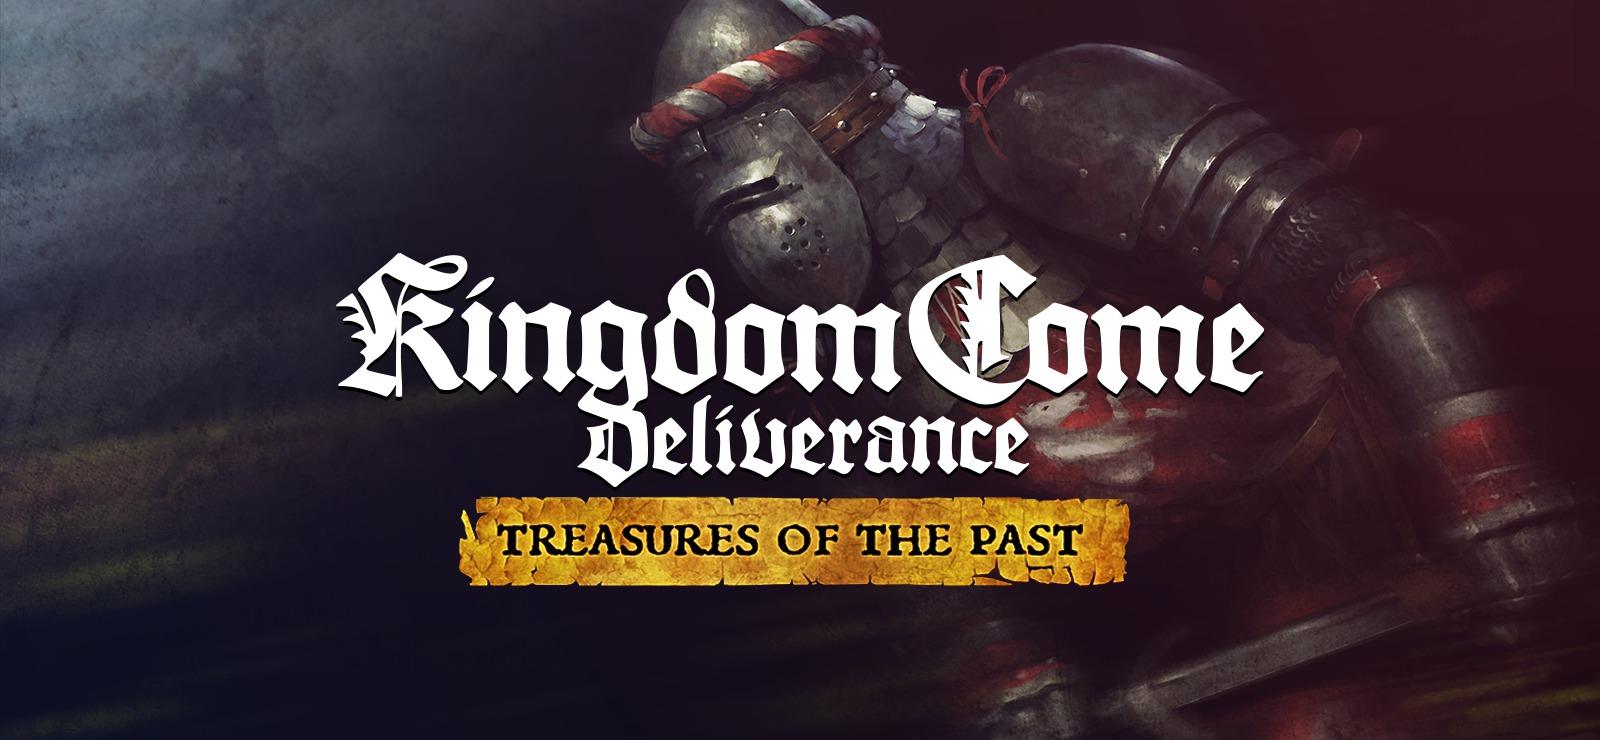 Kingdom Come: Deliverance - Treasures of the Past (DLC) (PC DIGITAL) (PC)